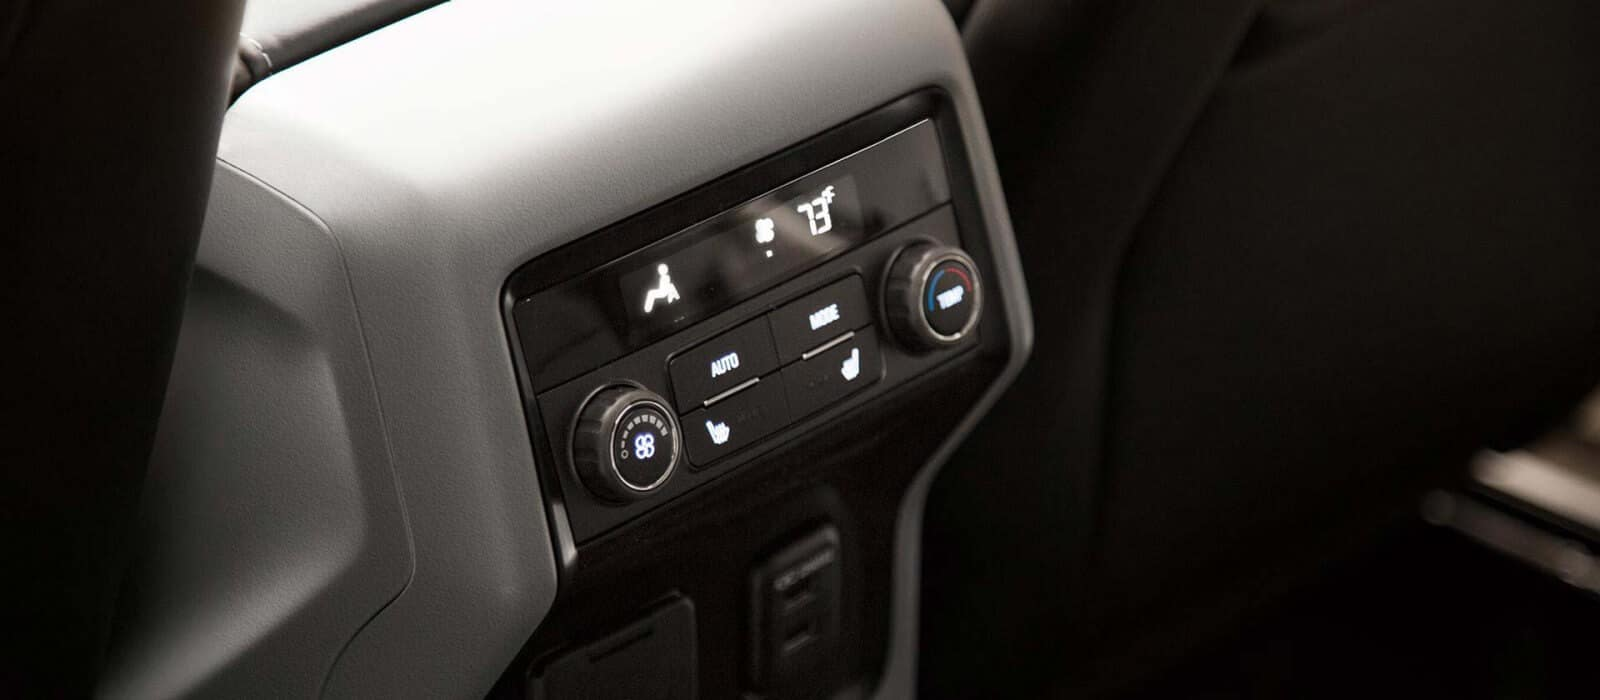 2018 GMC Acadia Rear Interior Features